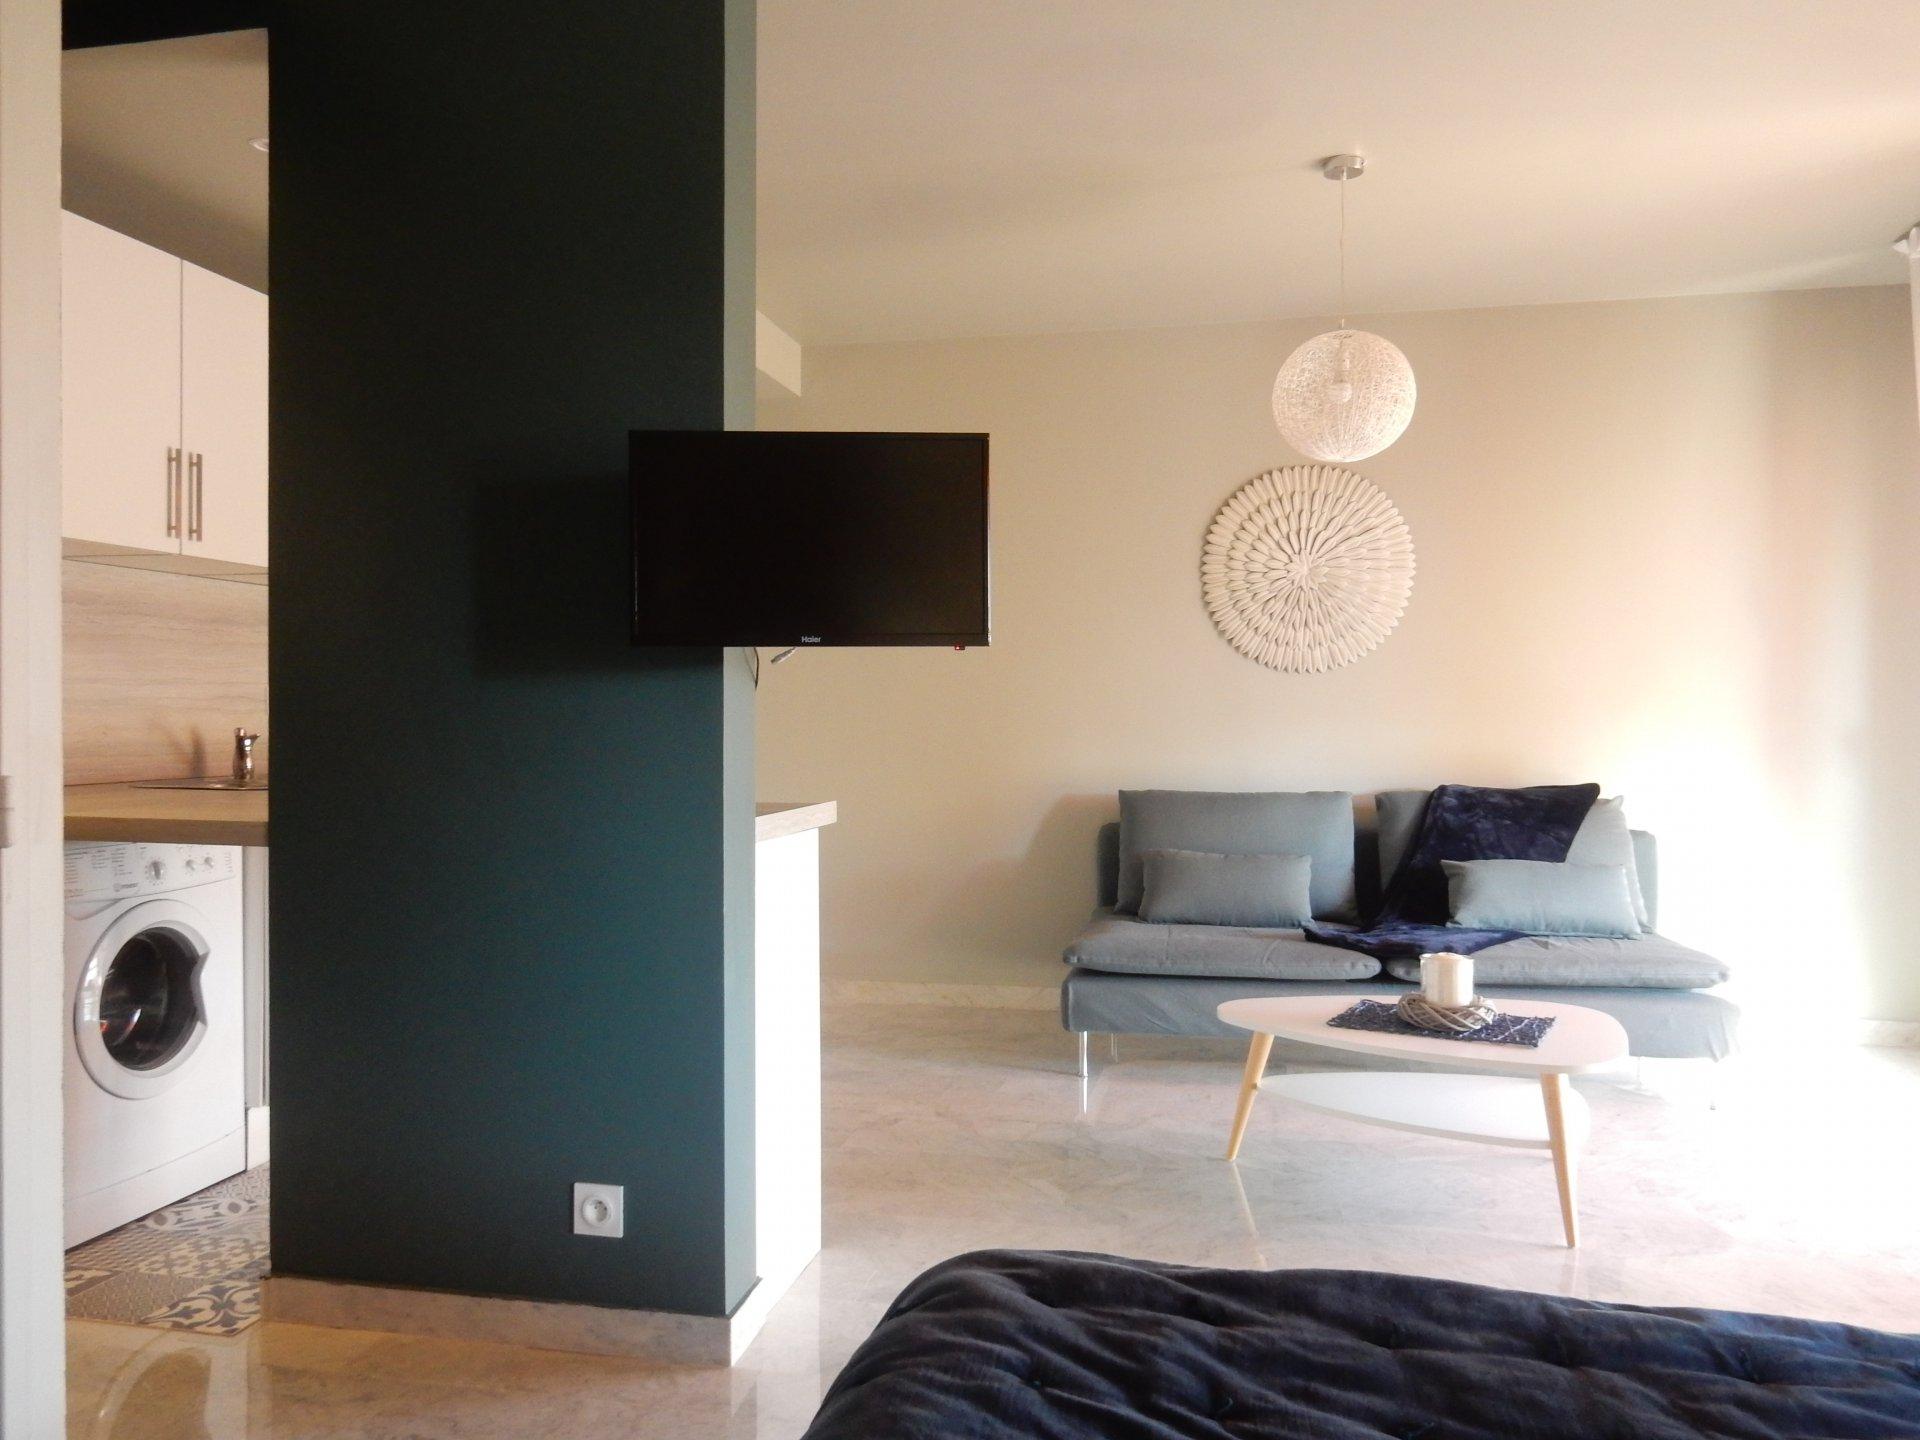 ocation Nice appartement 2 pièces meublé rénové quartier bas Sainte Marguerite proche promenade